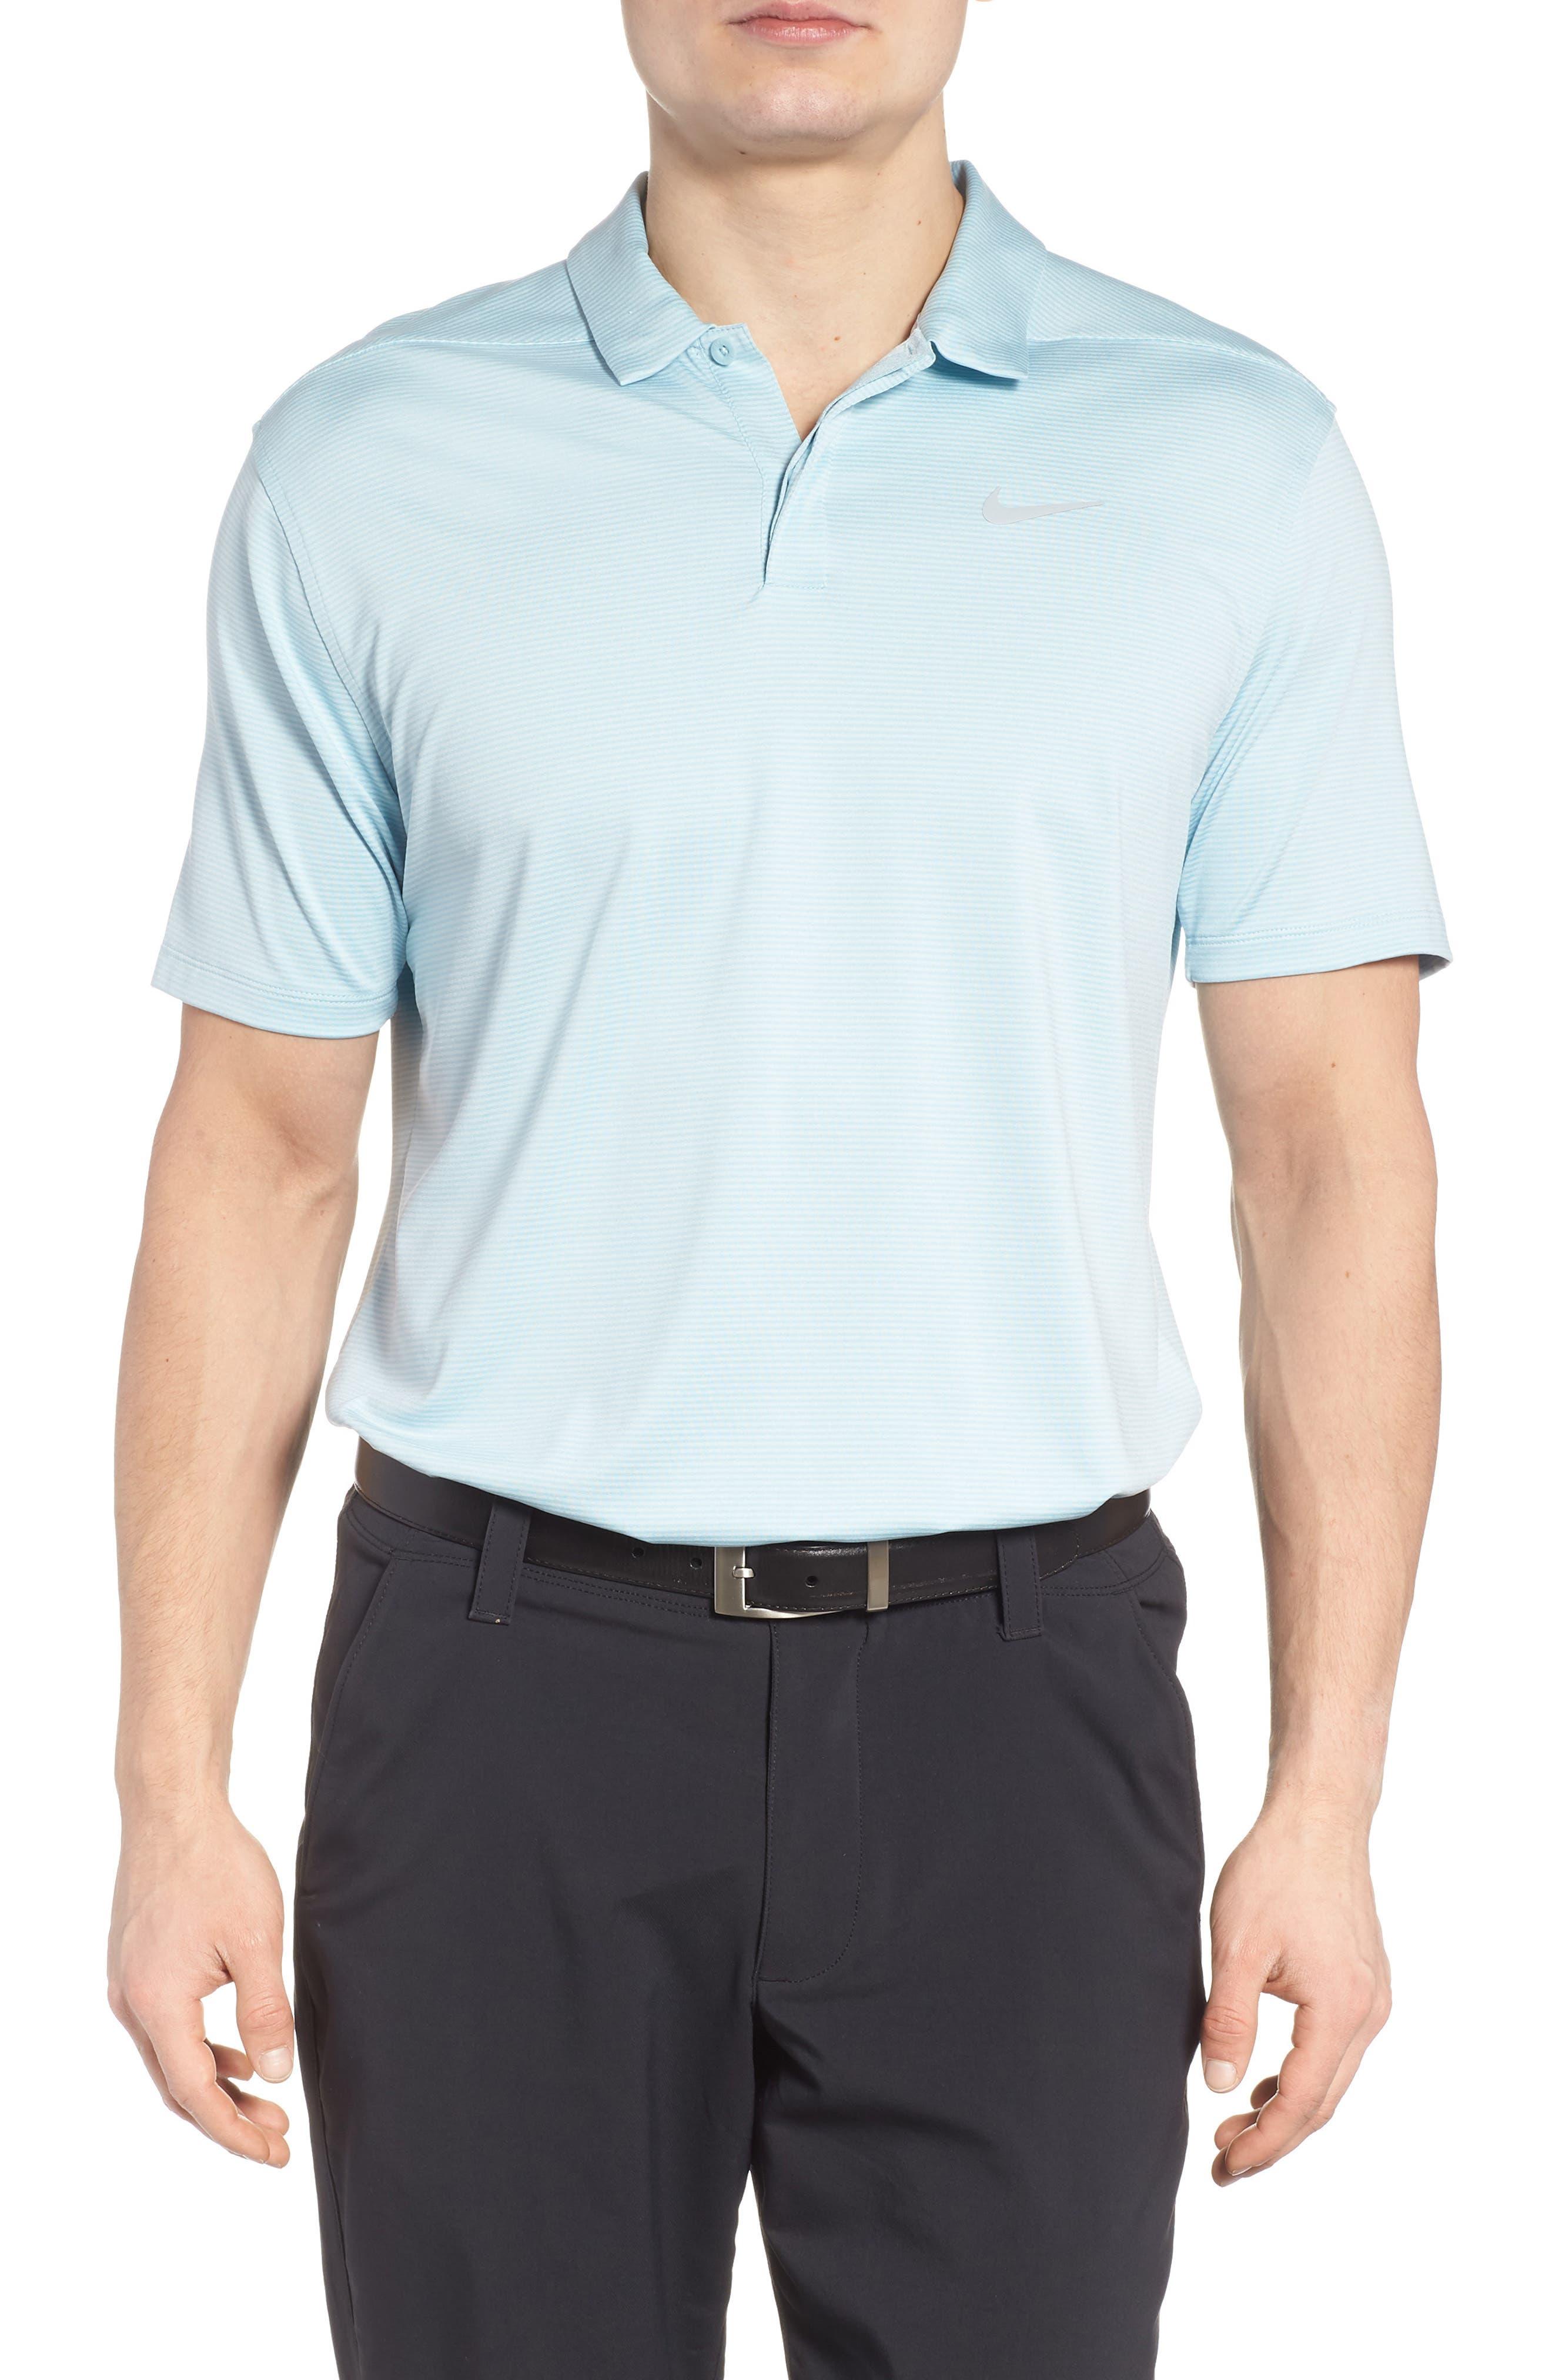 Dry Polo Shirt,                         Main,                         color, OCEAN BLISS/ SILVER